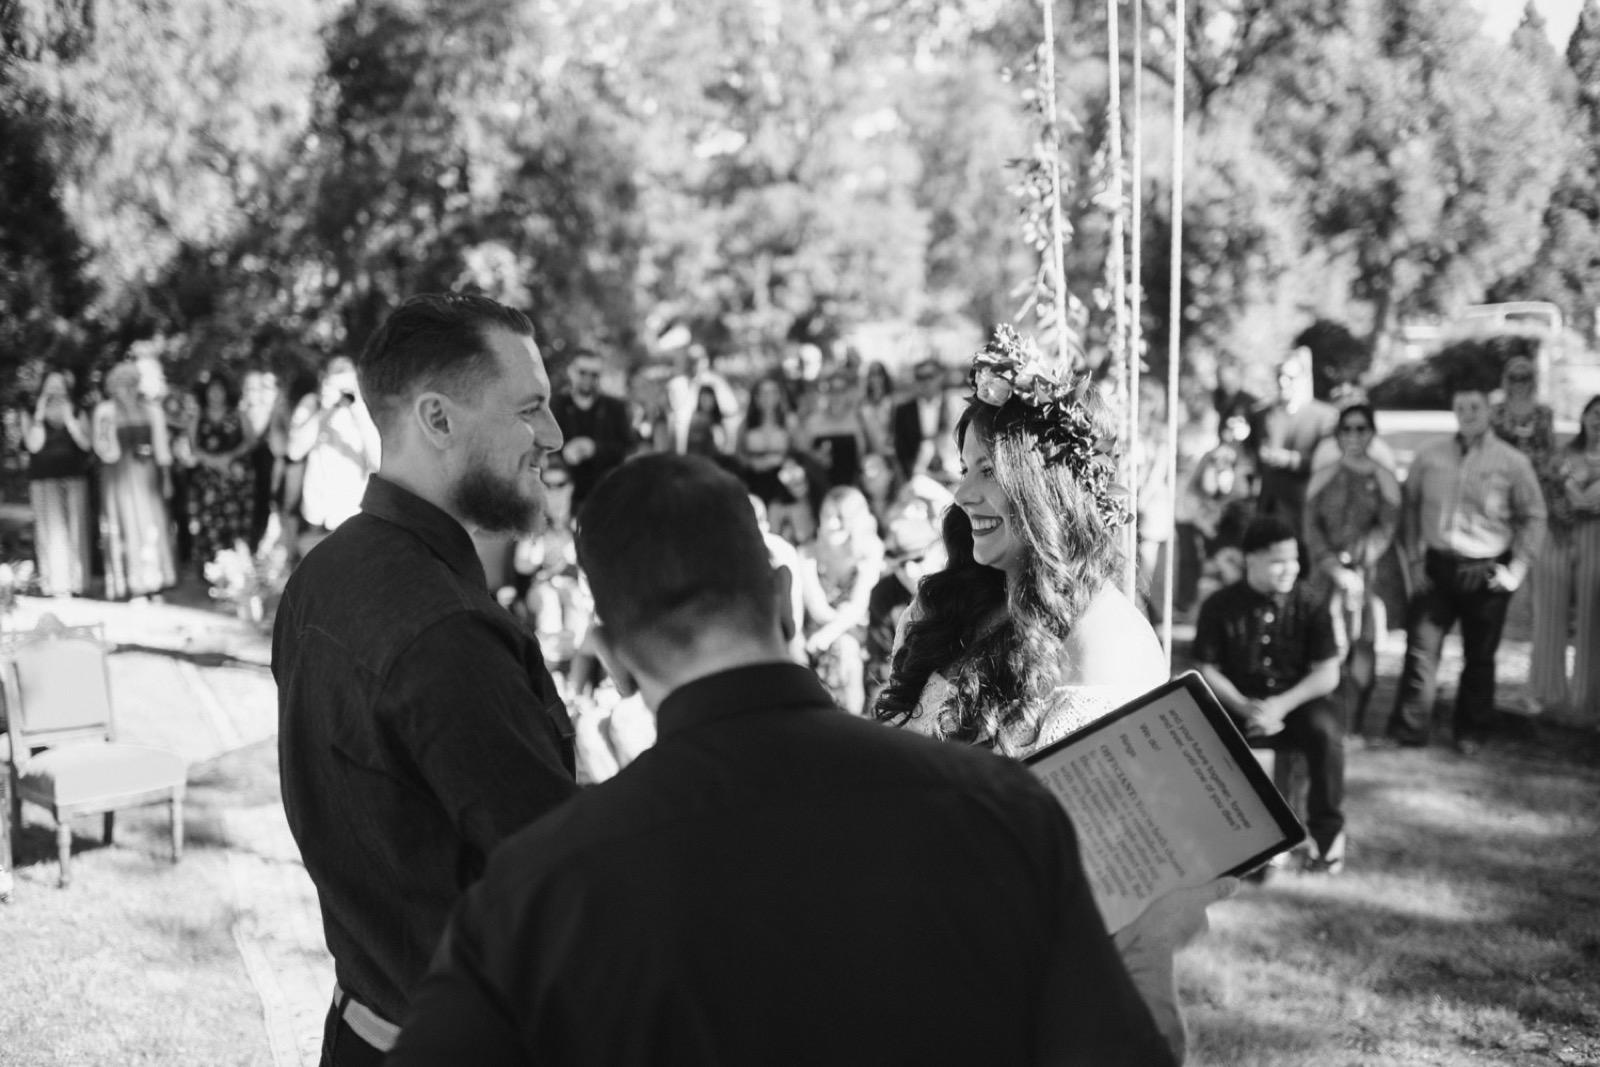 073_California_Ranch_Wedding185.jpg